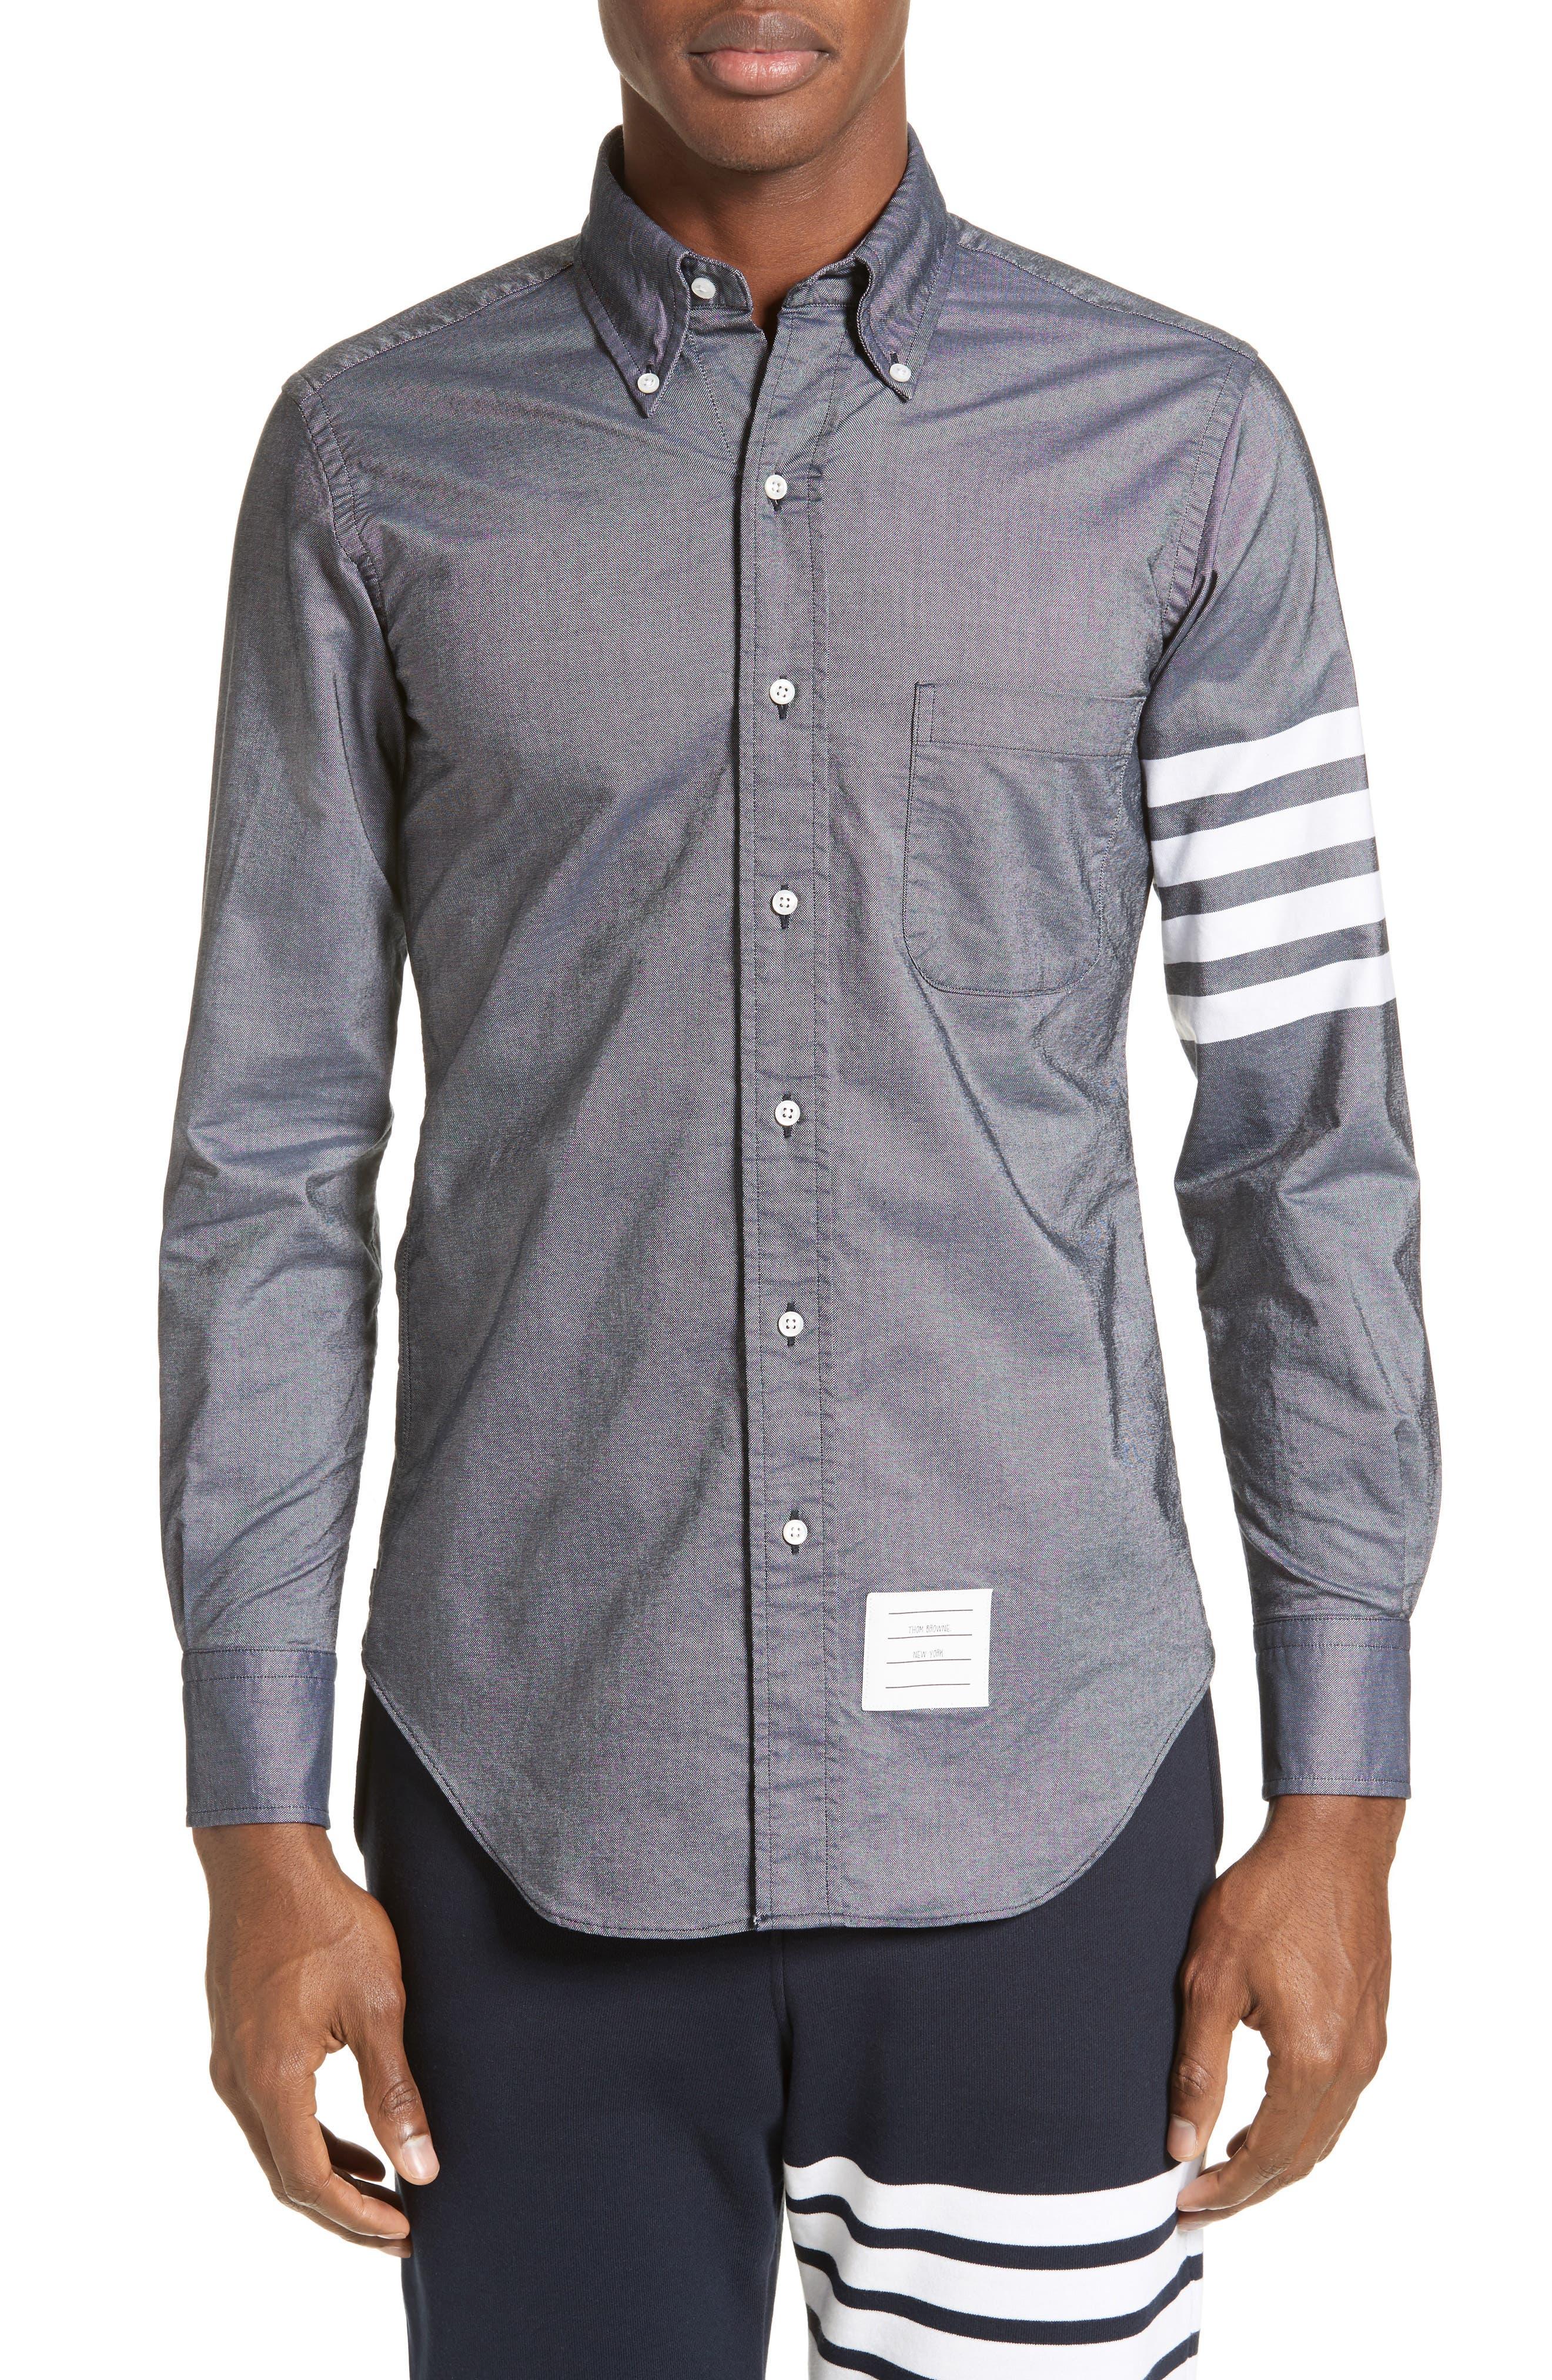 Alternate Image 1 Selected - Thom Browne Trim Fit Classic 4-Bar Oxford Shirt